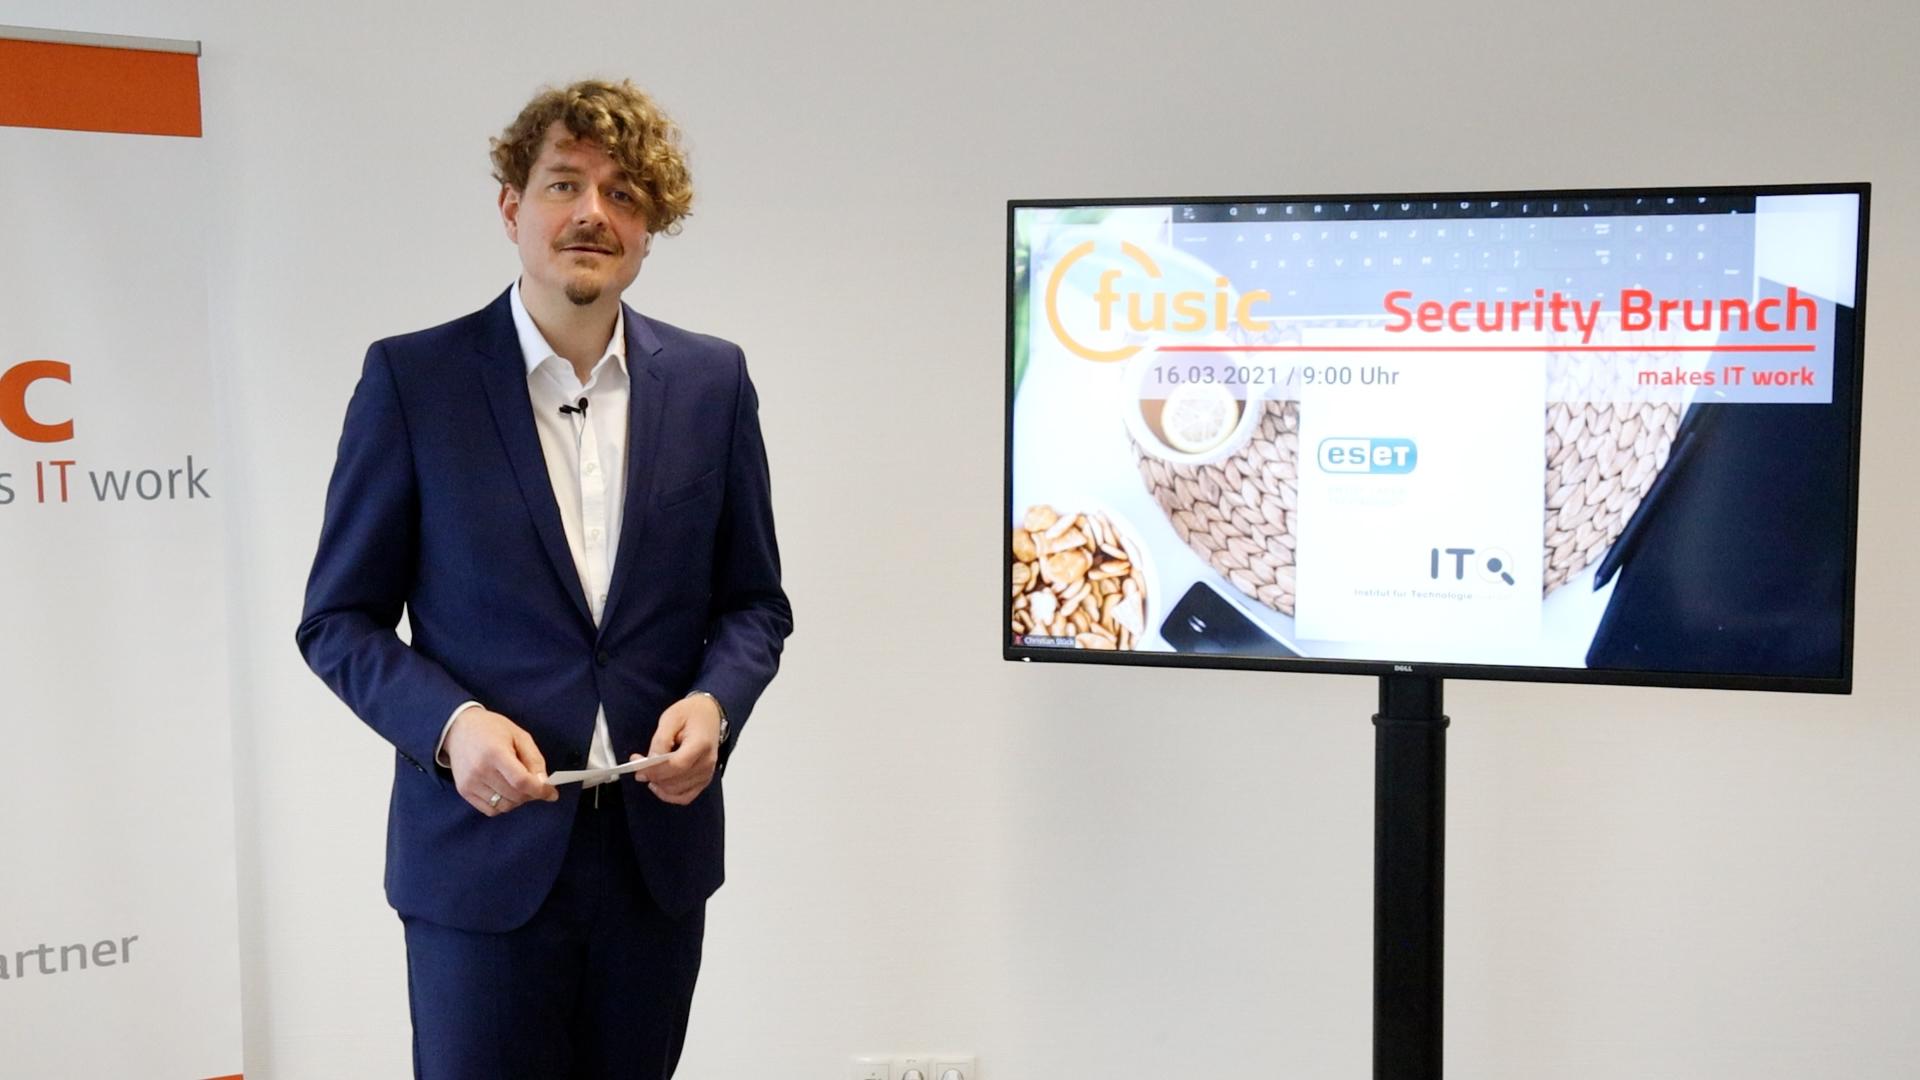 Security Brunch | Christian Stück | Geschäftsführer fusic IT-Systemhaus Würzburg